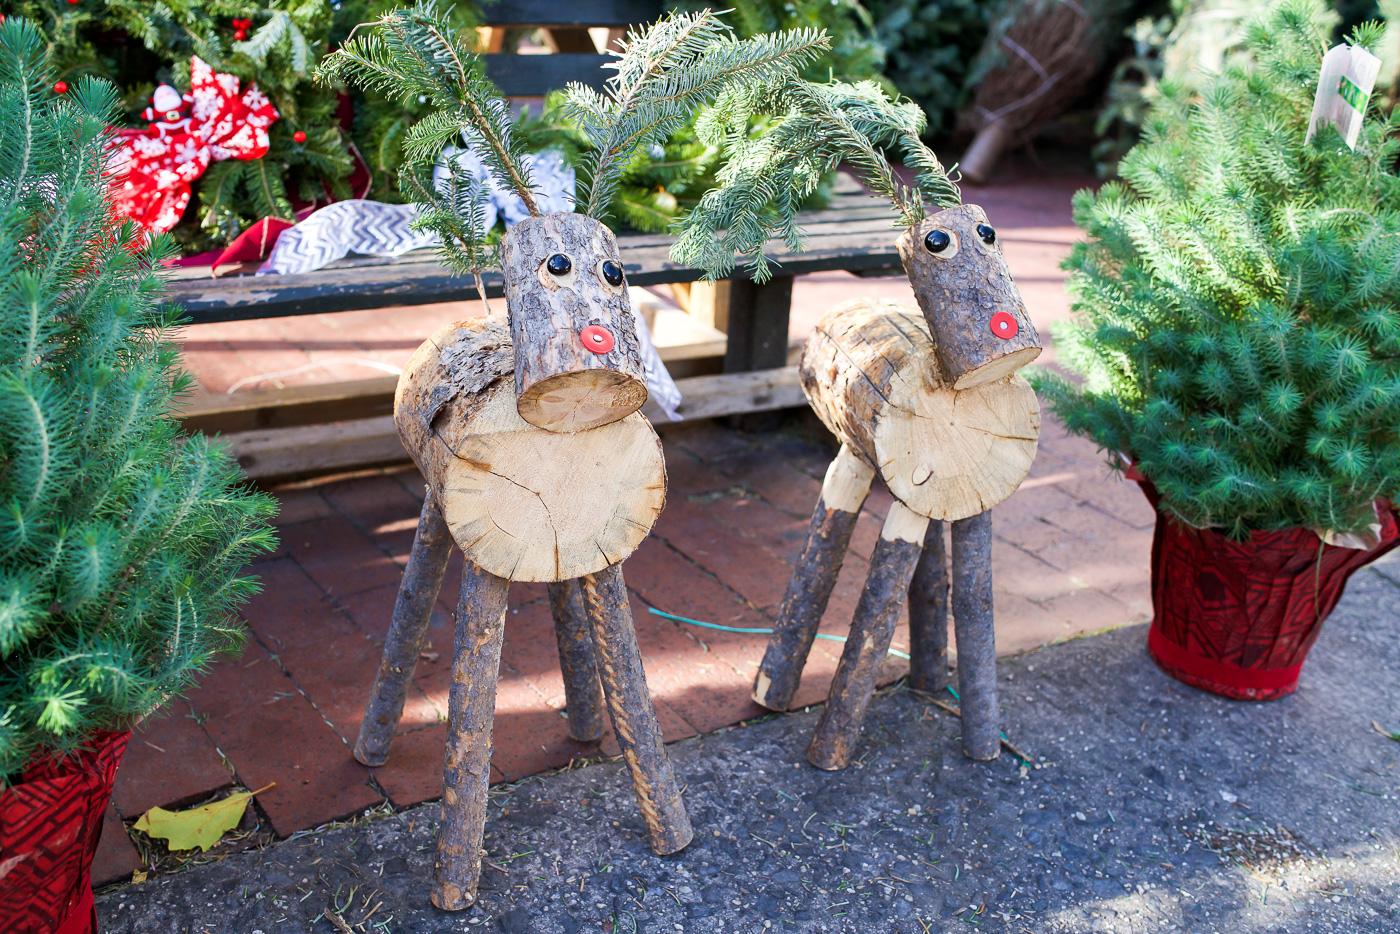 j crew regent blazer - Christmas Tree Shopping